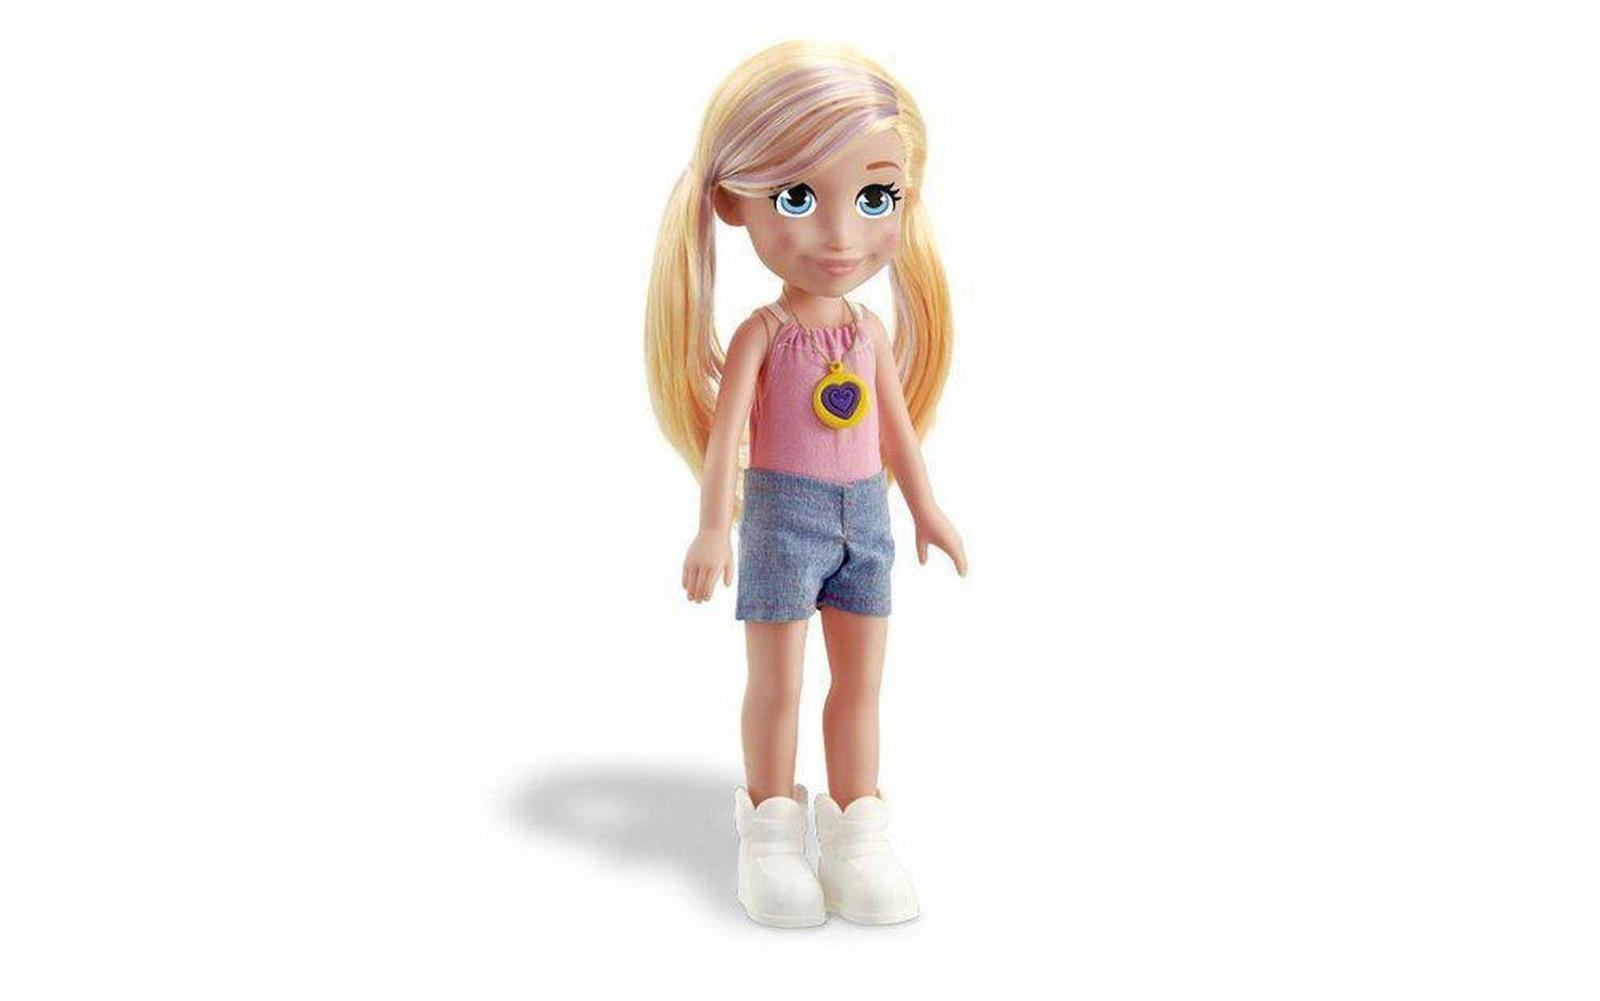 Boneca Polly Pocket Surfista - Pupee